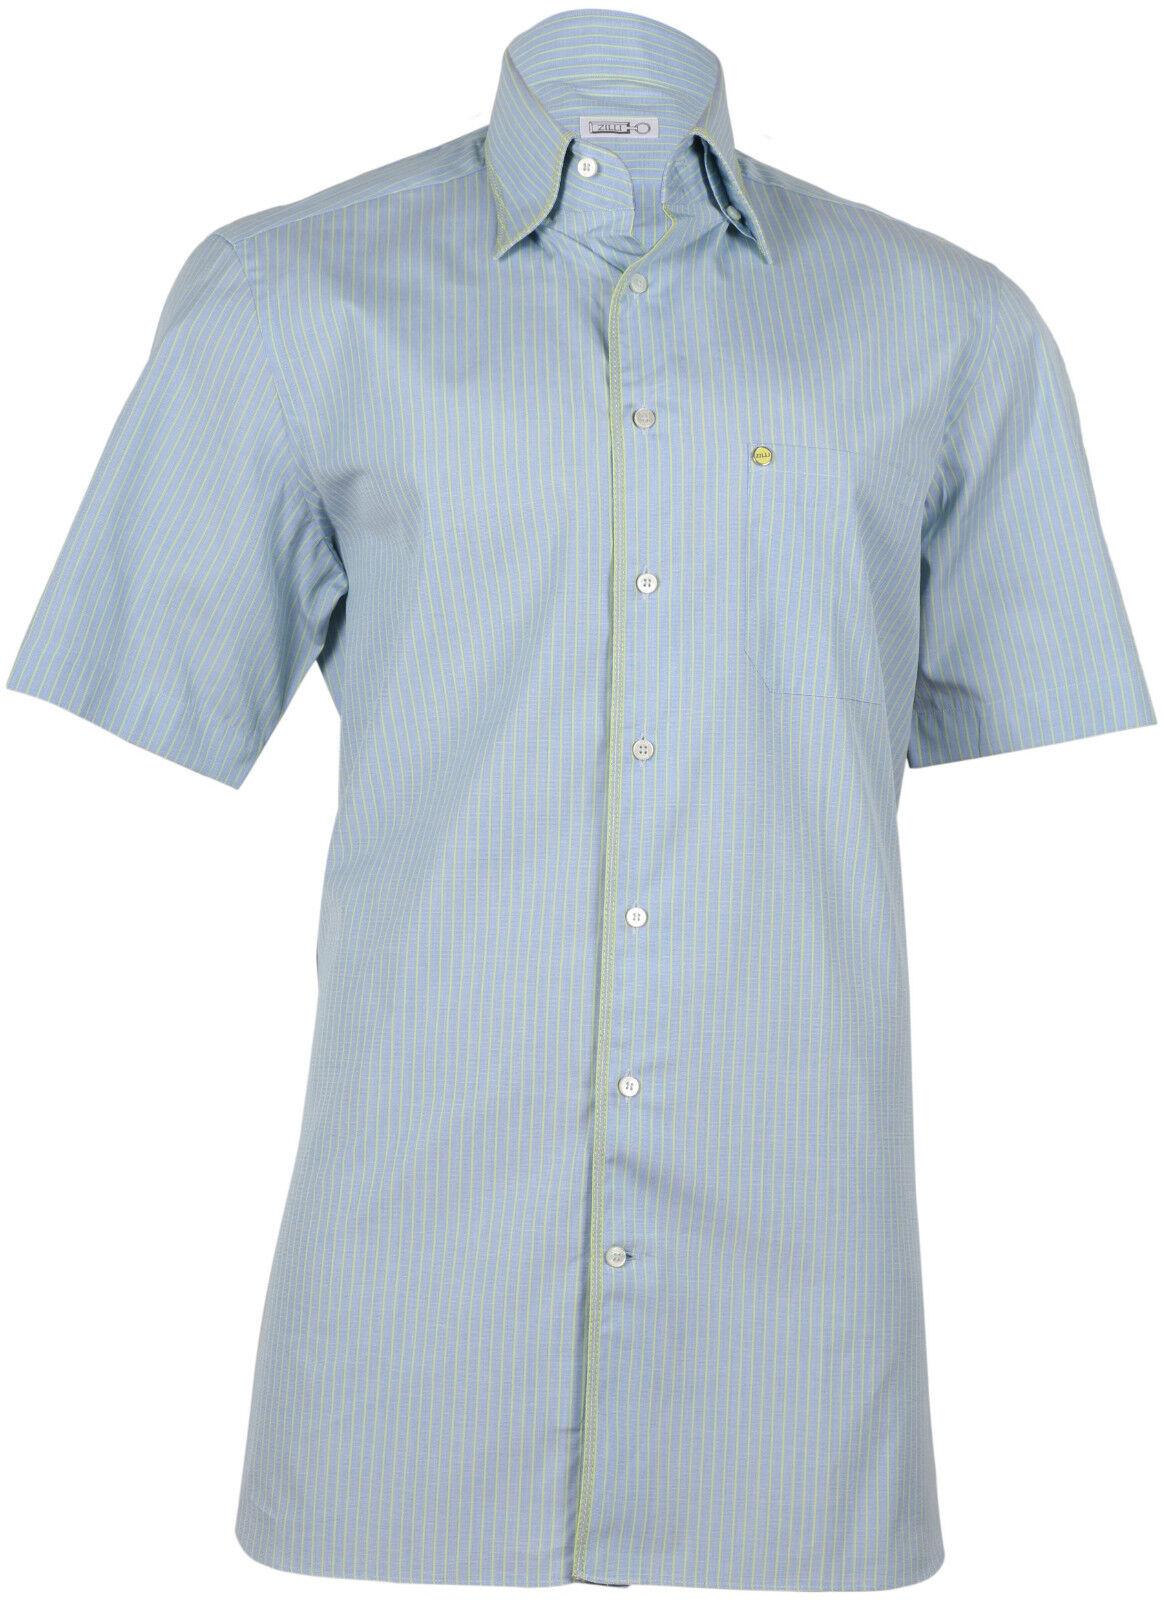 Zilli Men's bluee Green Cotton Shirt Short Sleeve Slim fit,Size 40(15.75), 46(18)